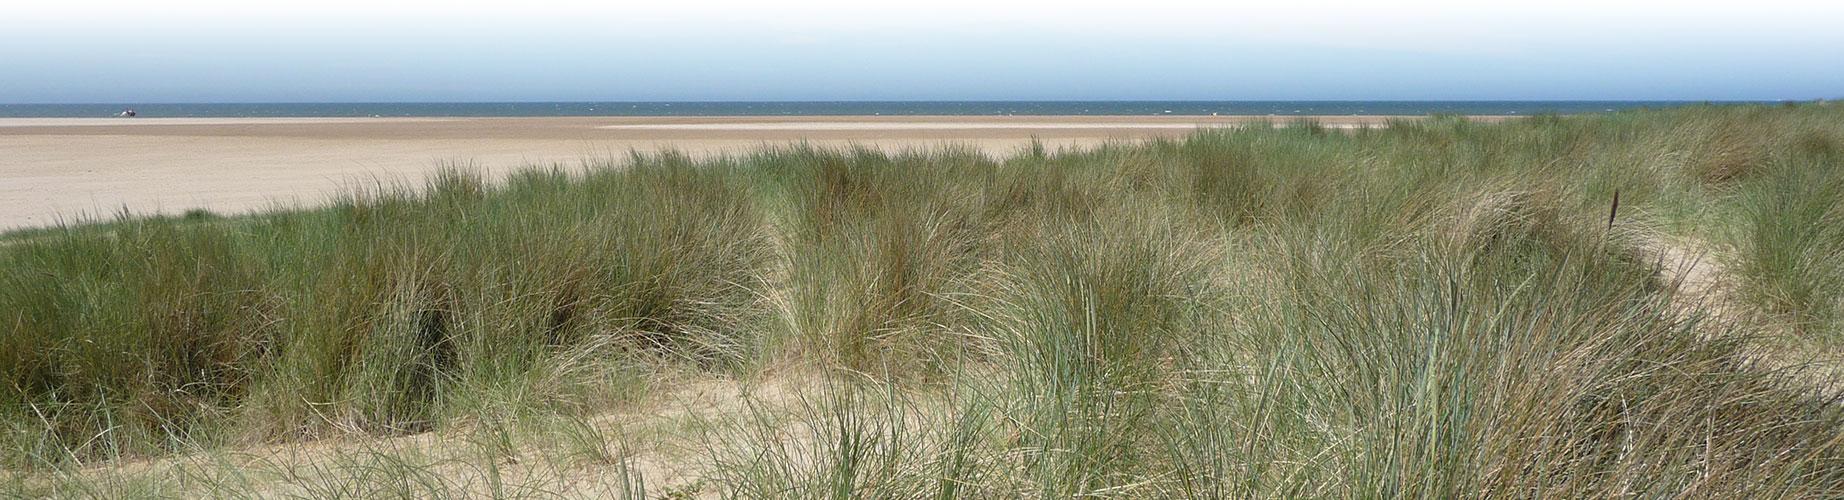 Wells-next-the-Sea Beach, Norfolk